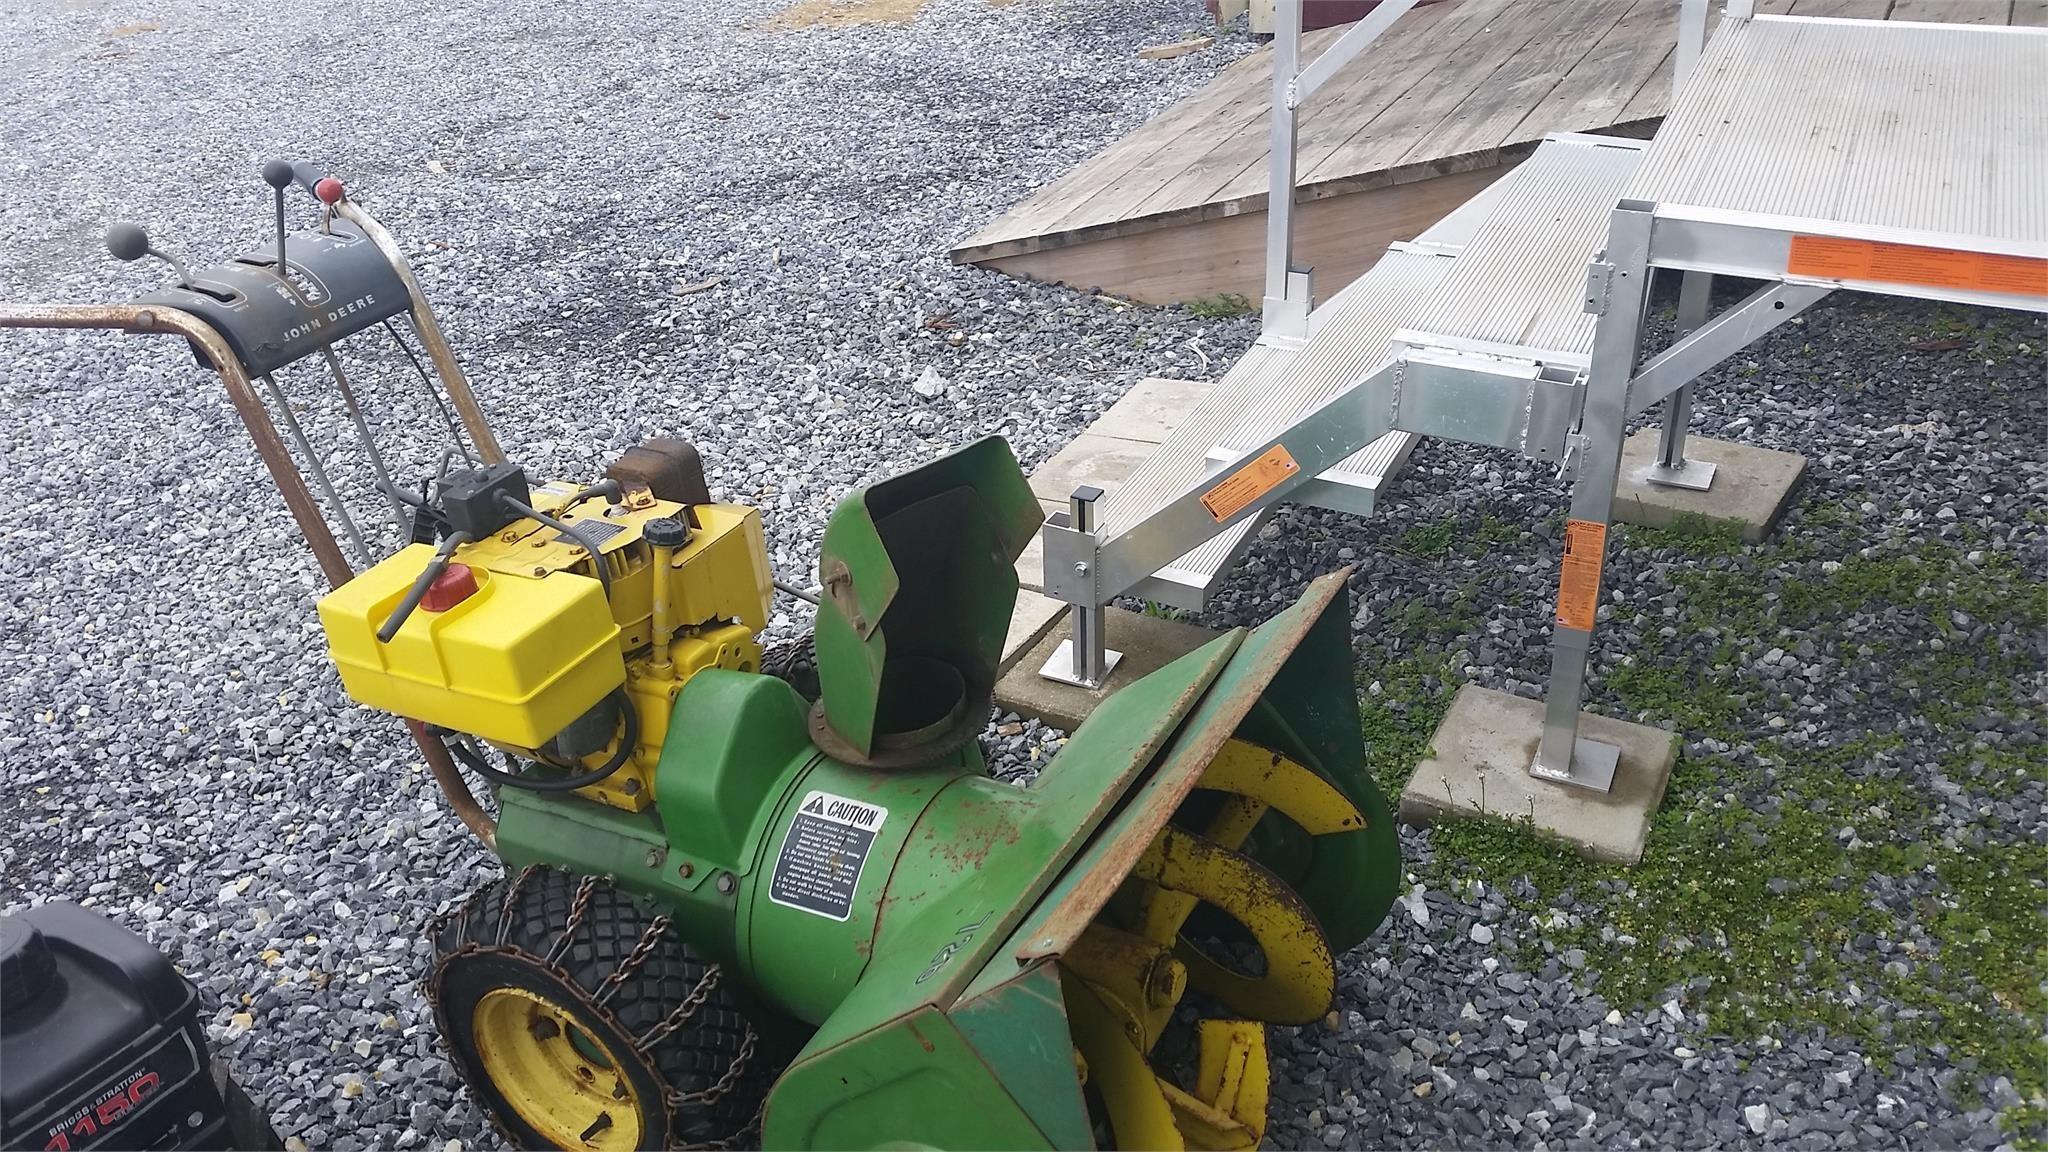 John Deere 726 Snow Blower